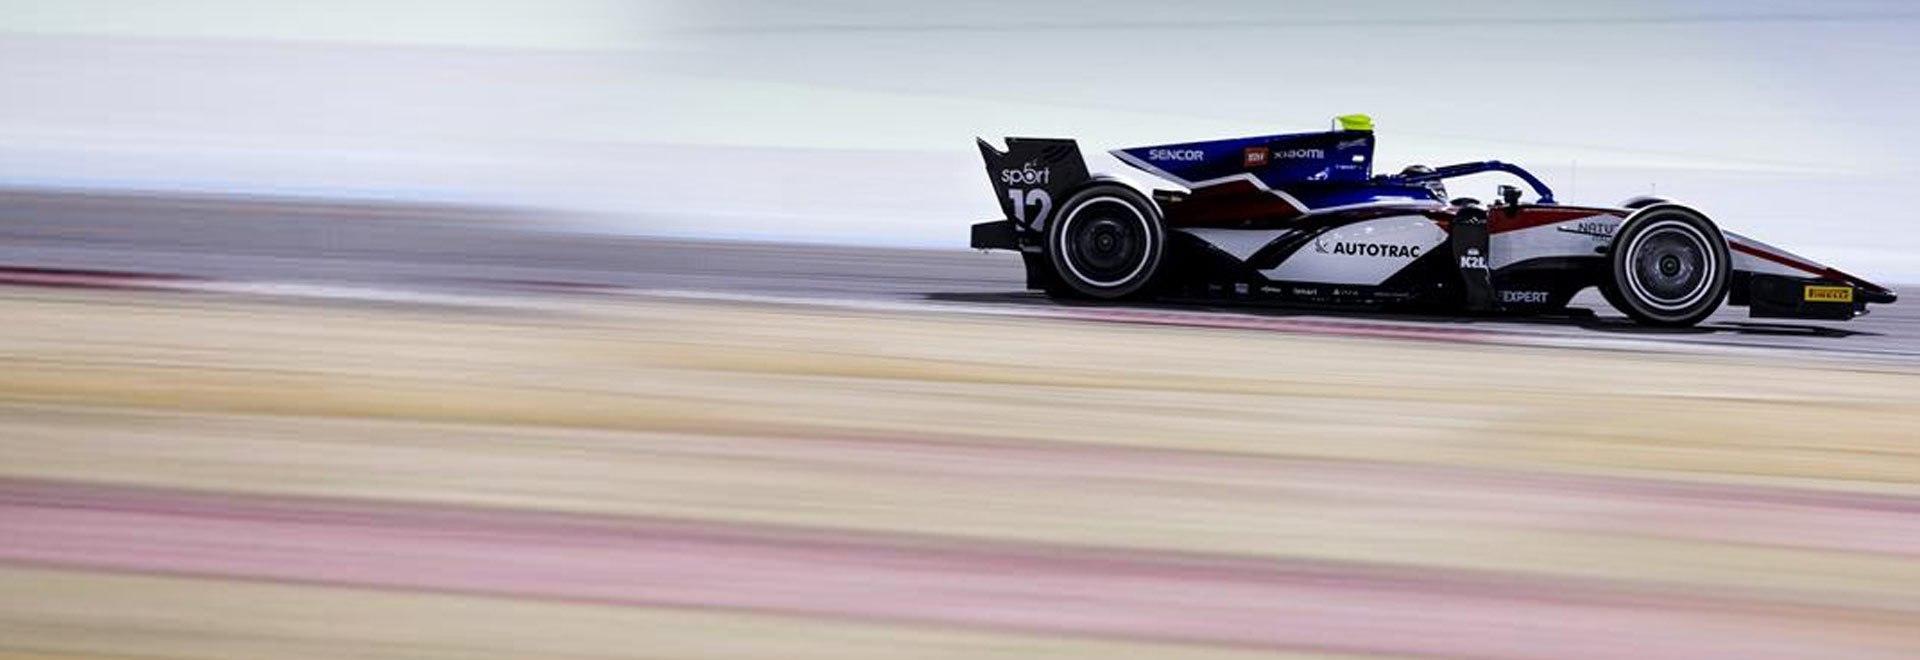 GP Austria. Sprint Race